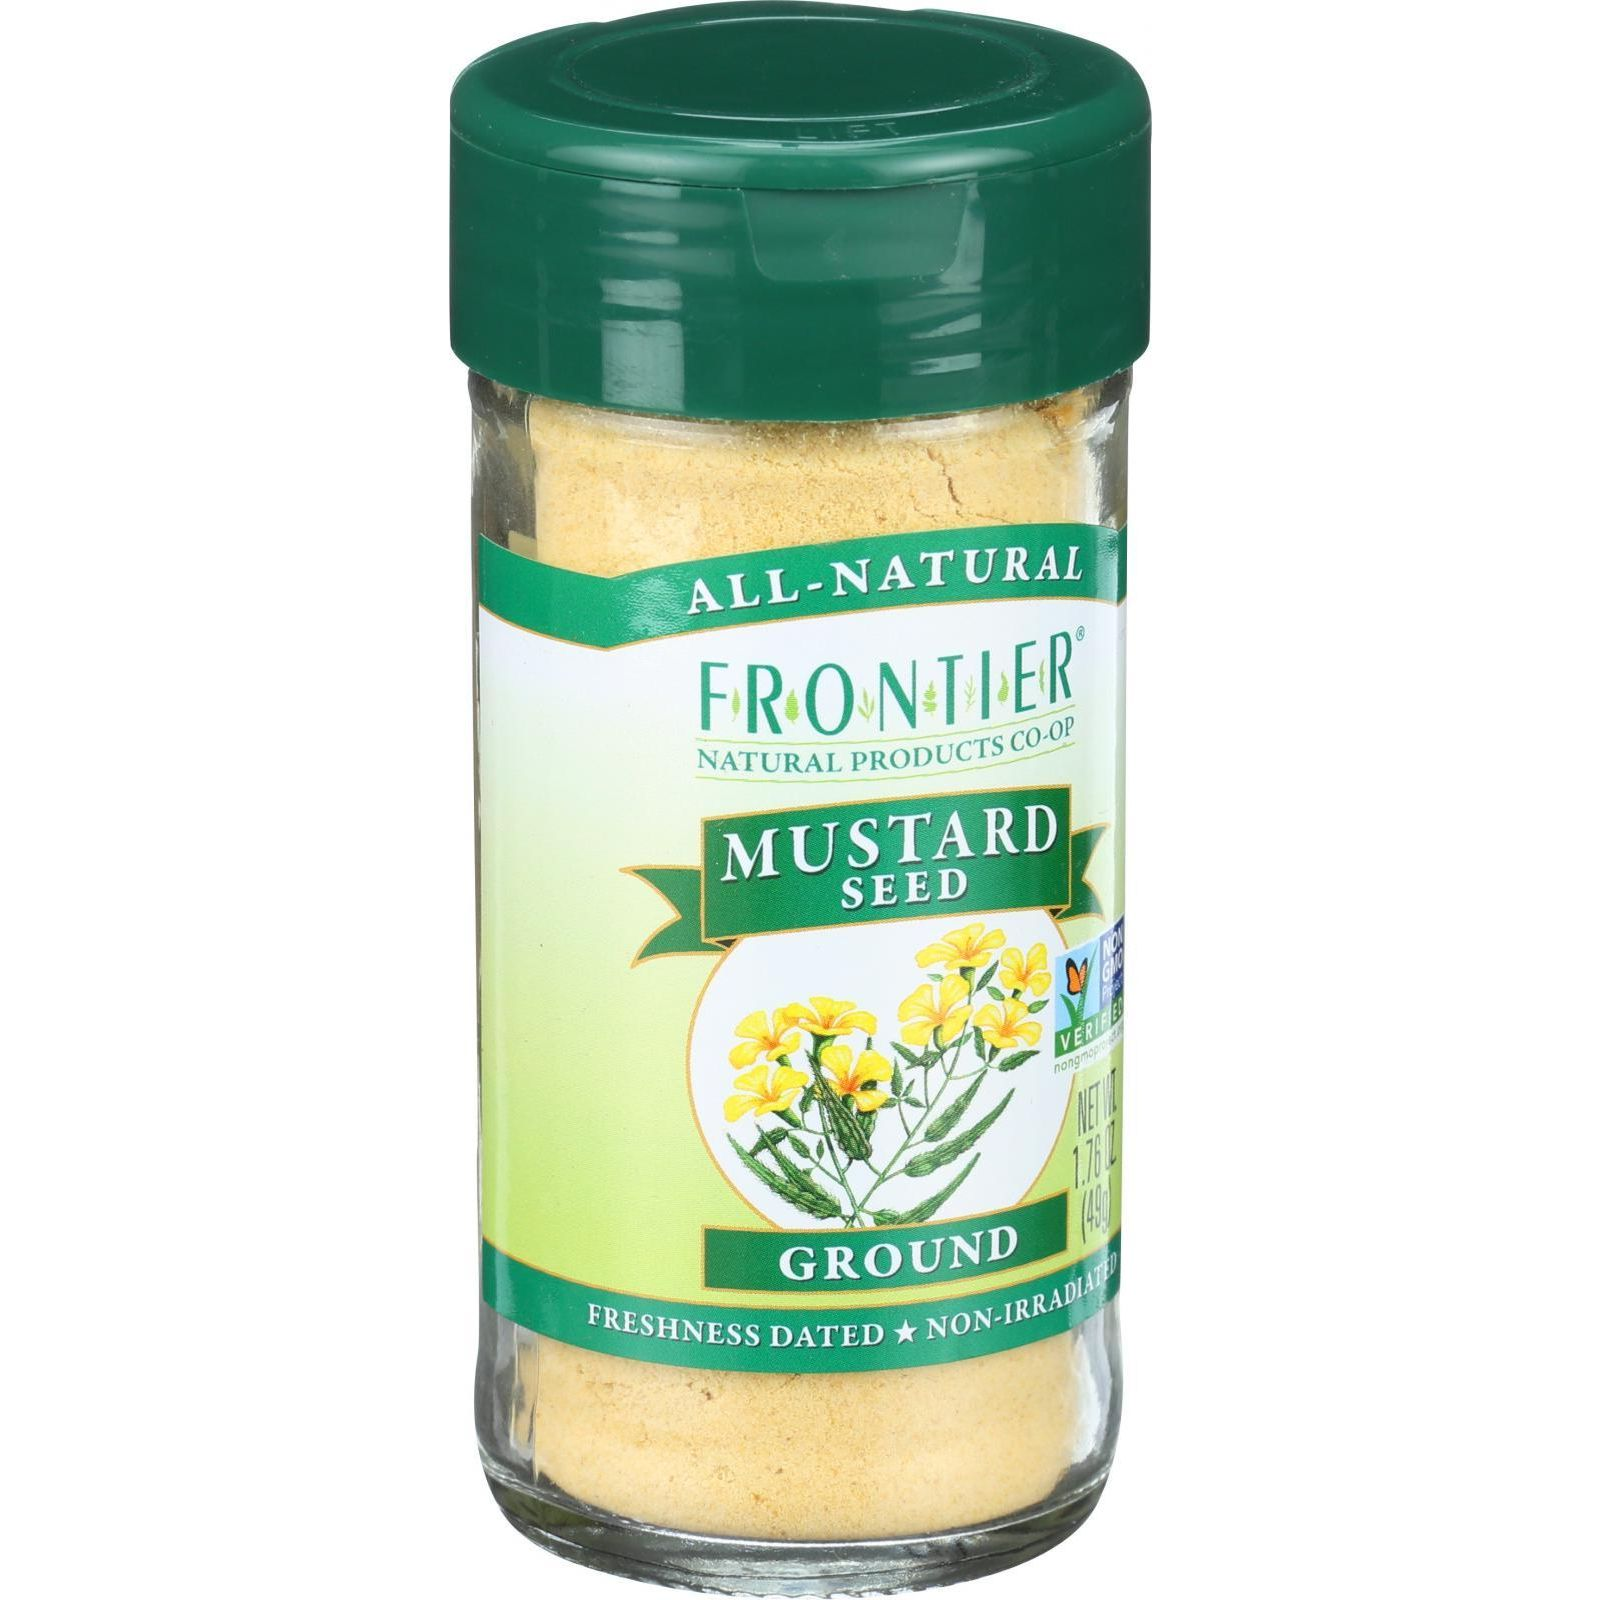 Frontier Herb Mustard Seed - Yellow - Ground - 1.76 oz